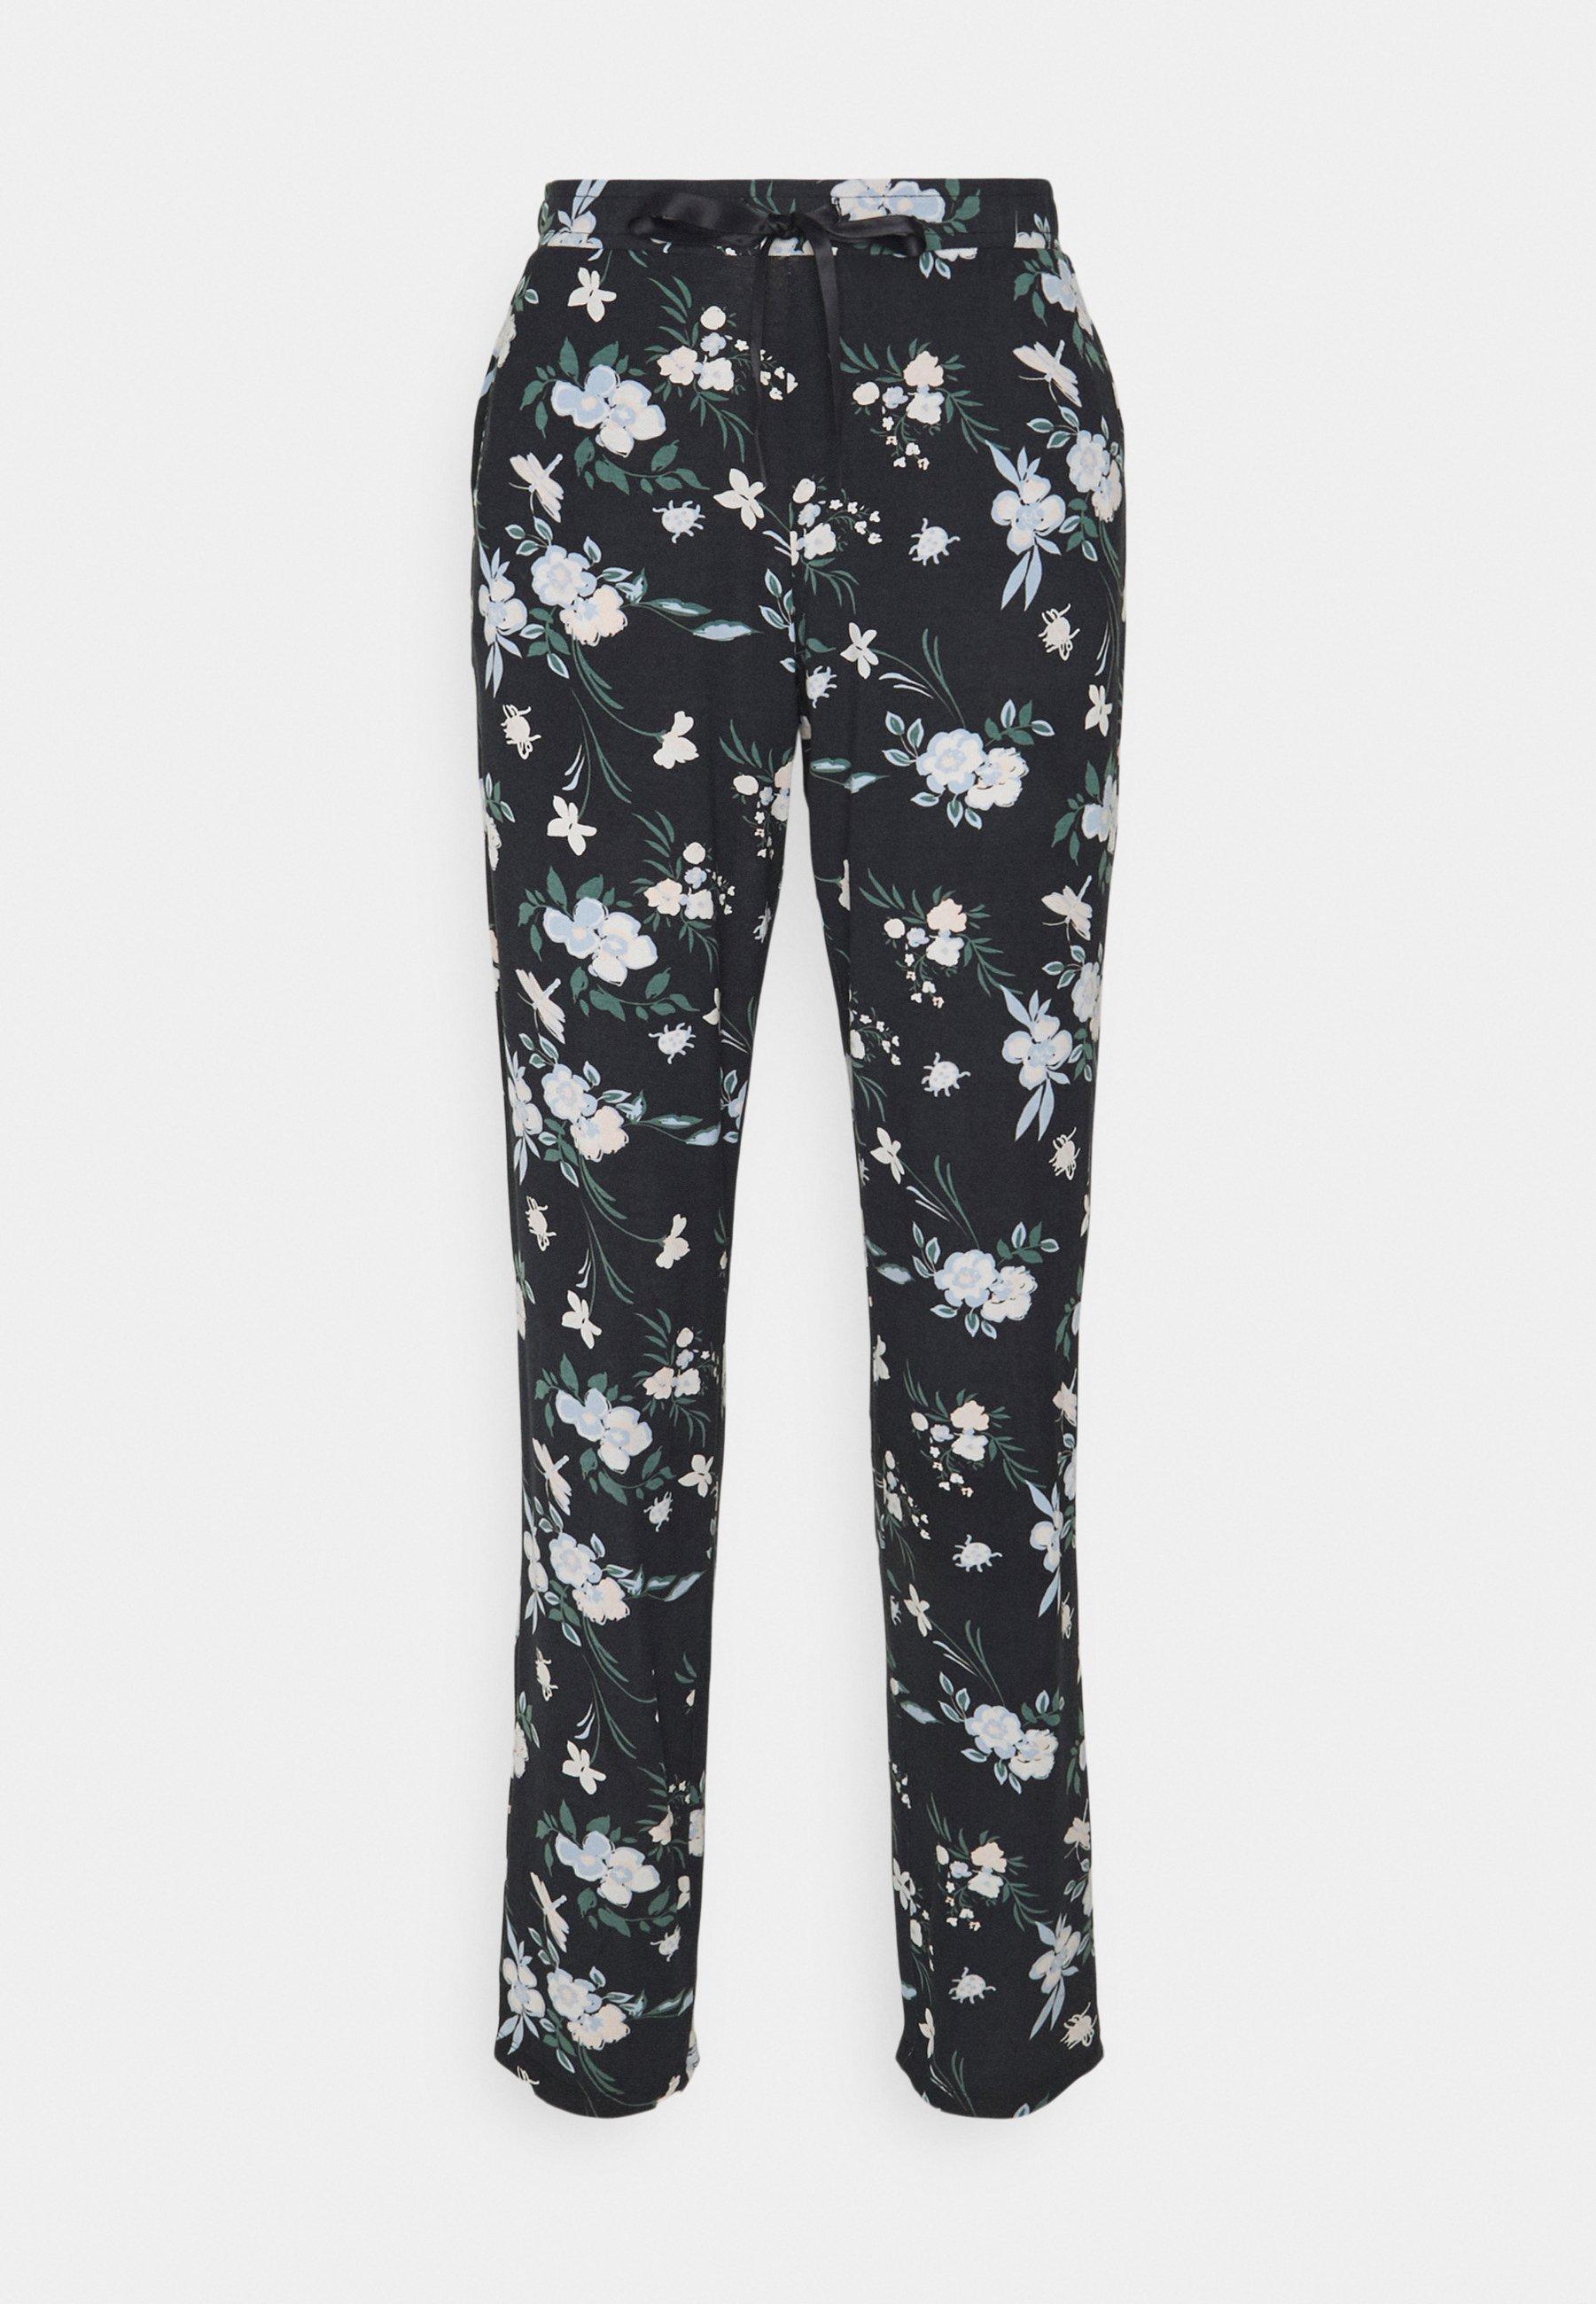 Donna MIX AND RELAX - Pantaloni del pigiama